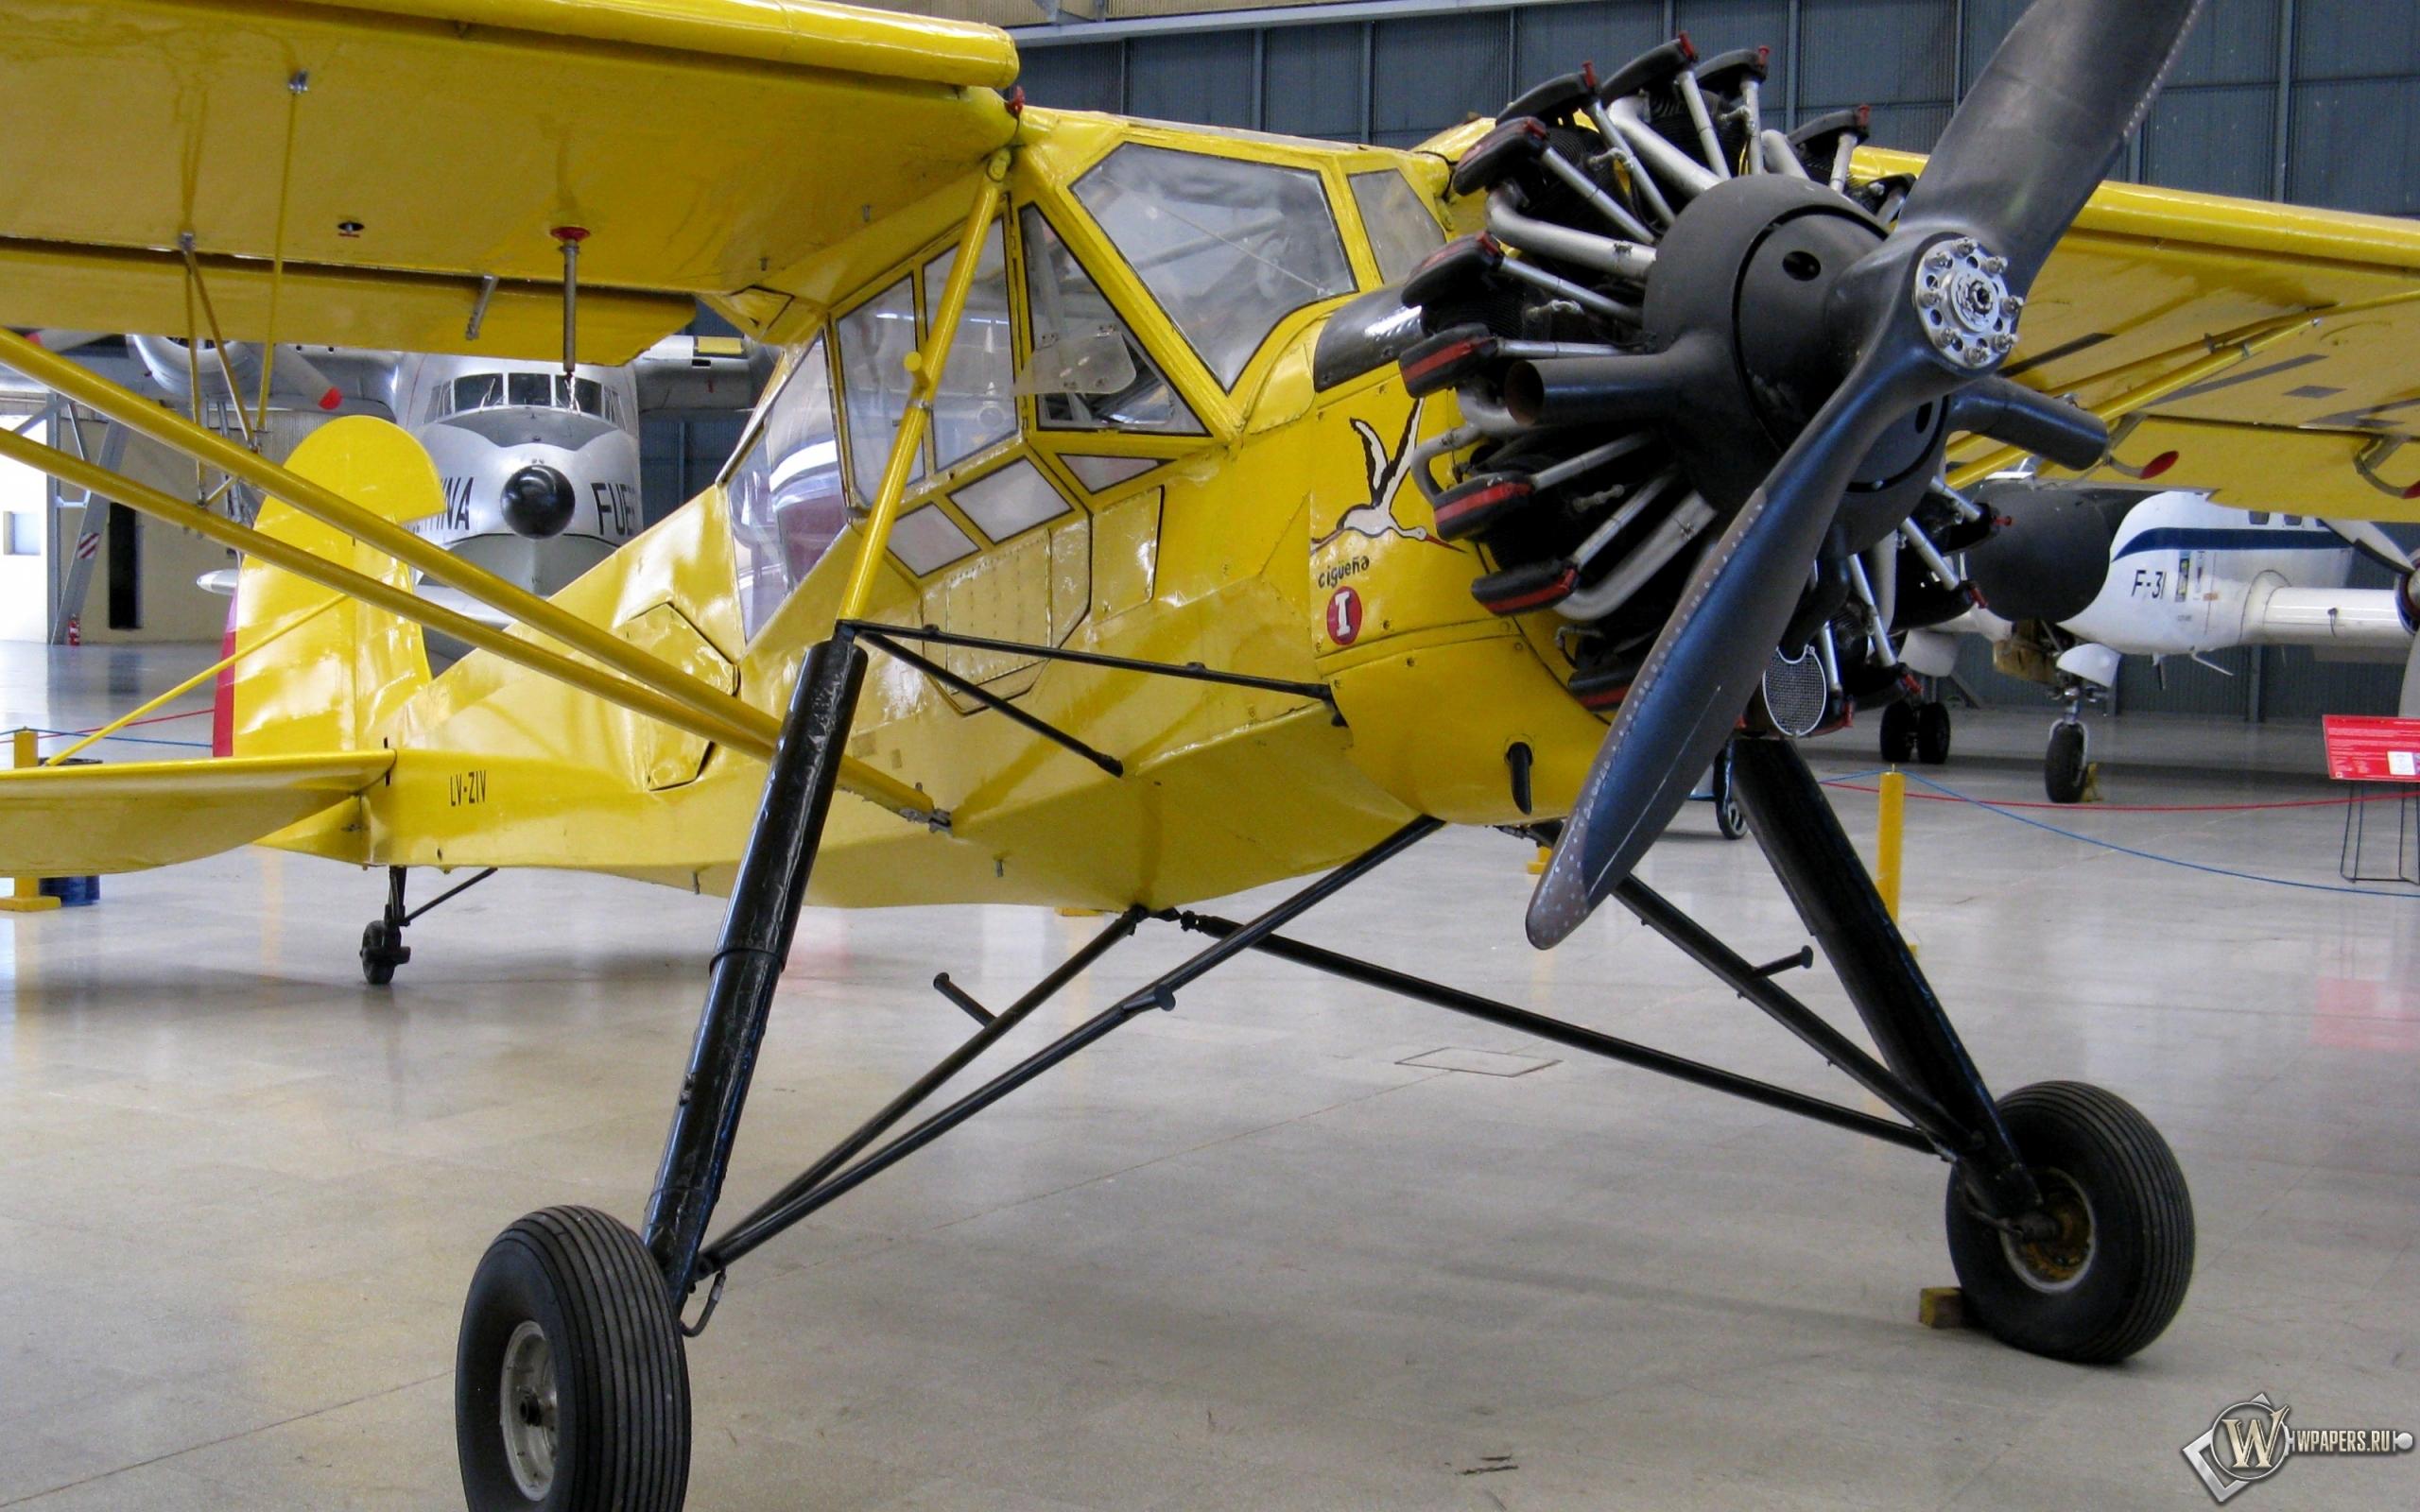 Fieseler Storch Fi-156 2560x1600